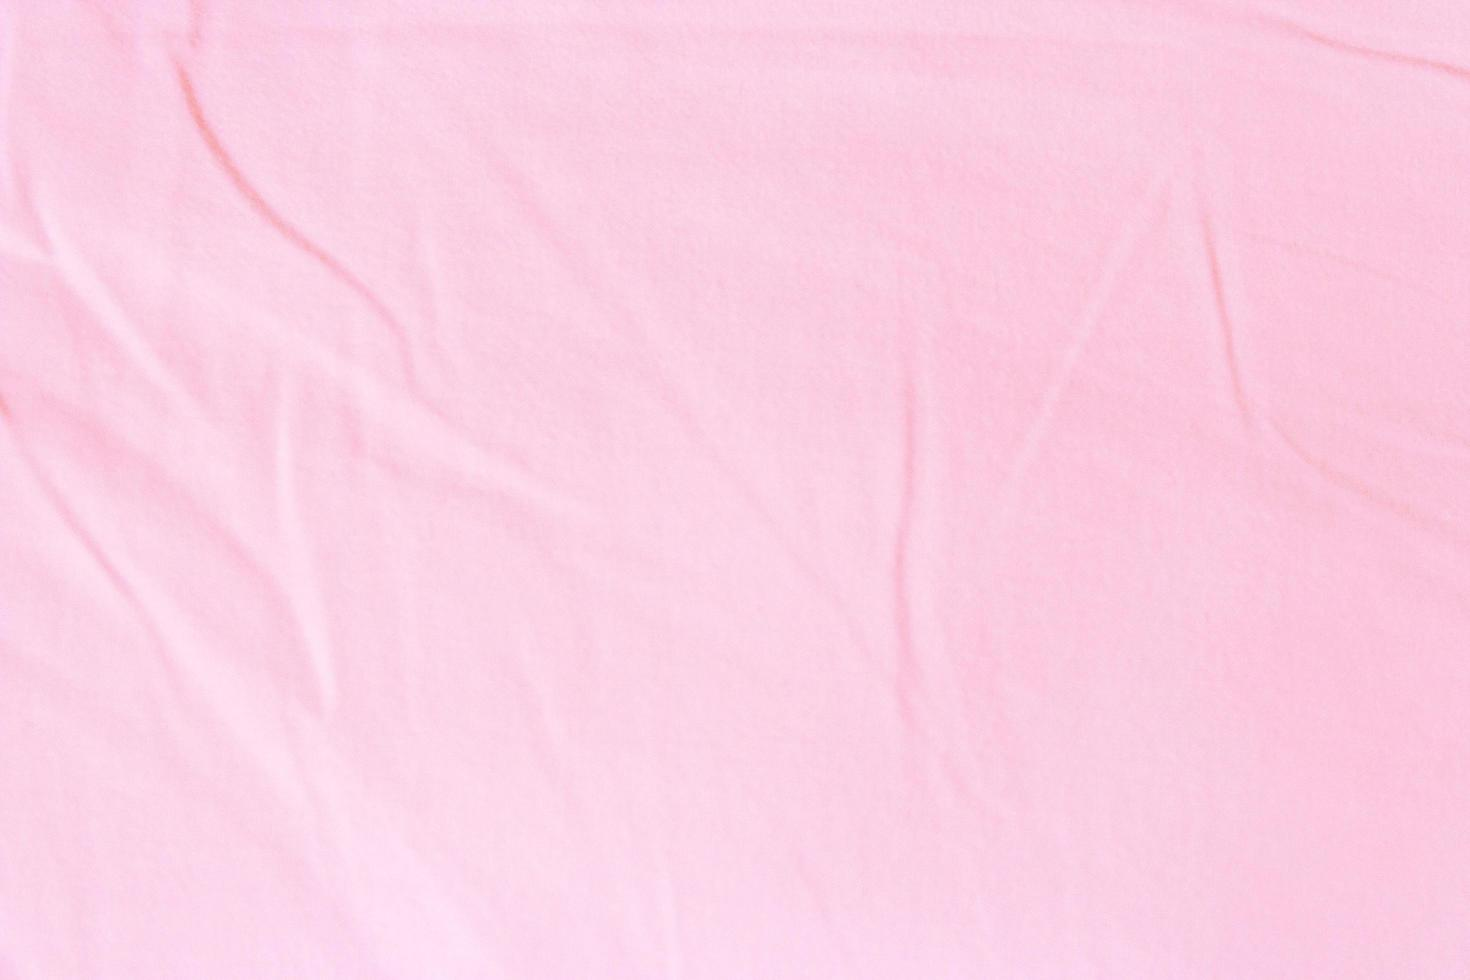 roze doek achtergrond foto